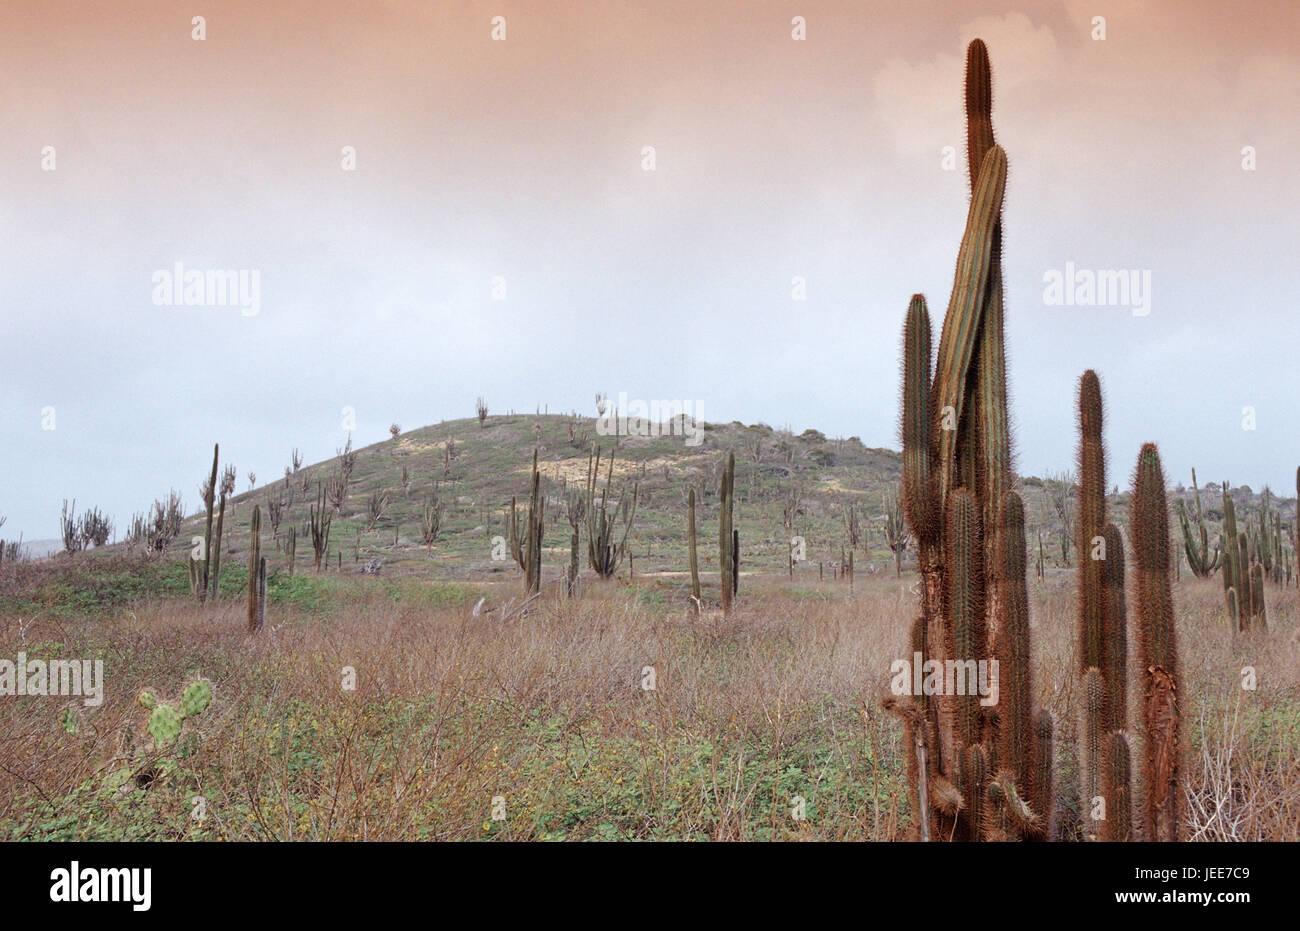 Vegetation, cacti, the Caribbean, voucher airs, - Stock Image